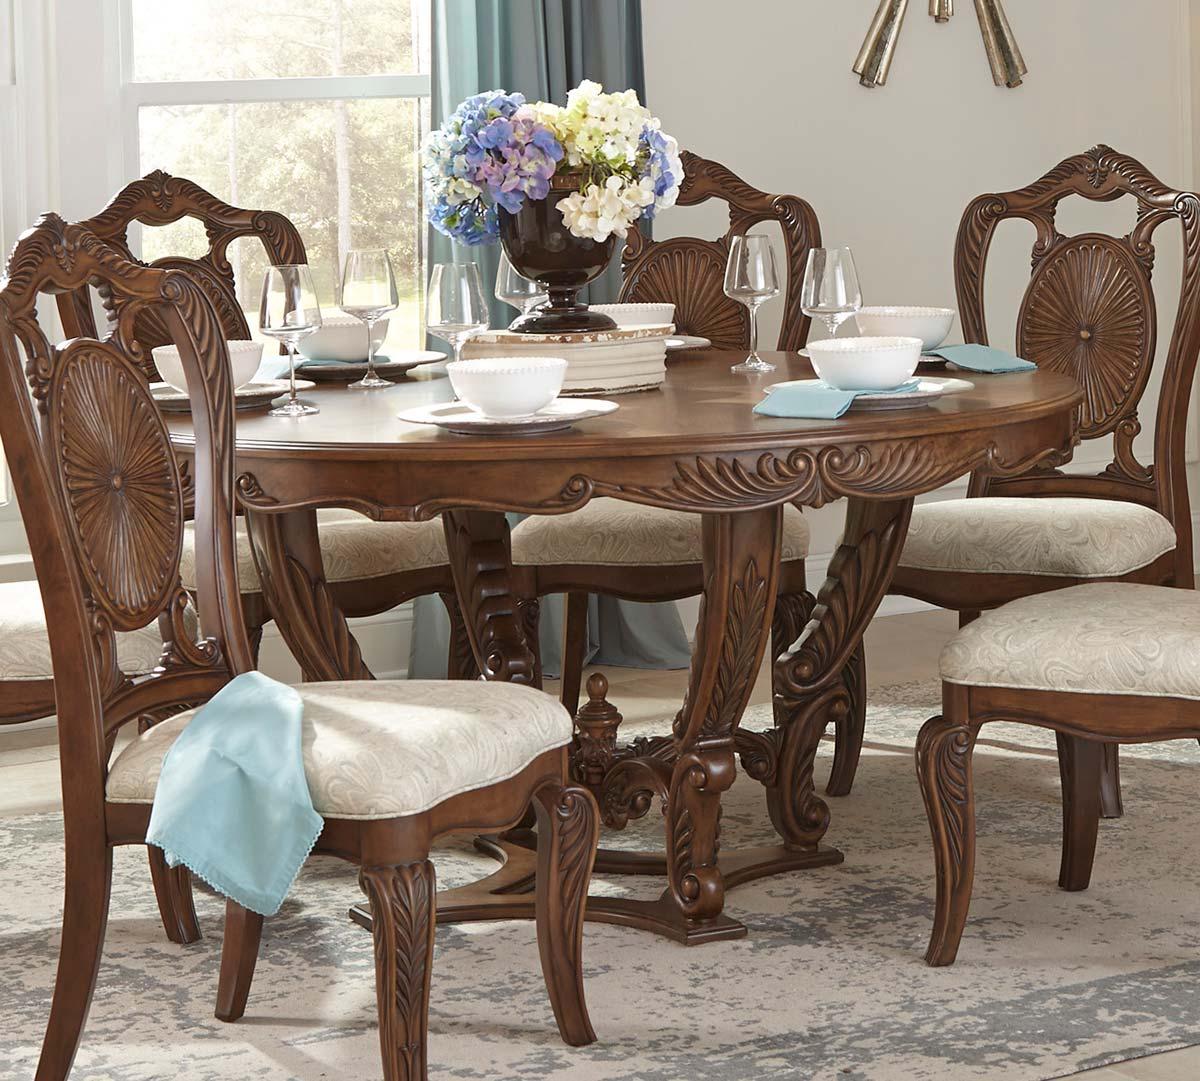 Homelegance Moorewood Park Round Dining Table - Pecan